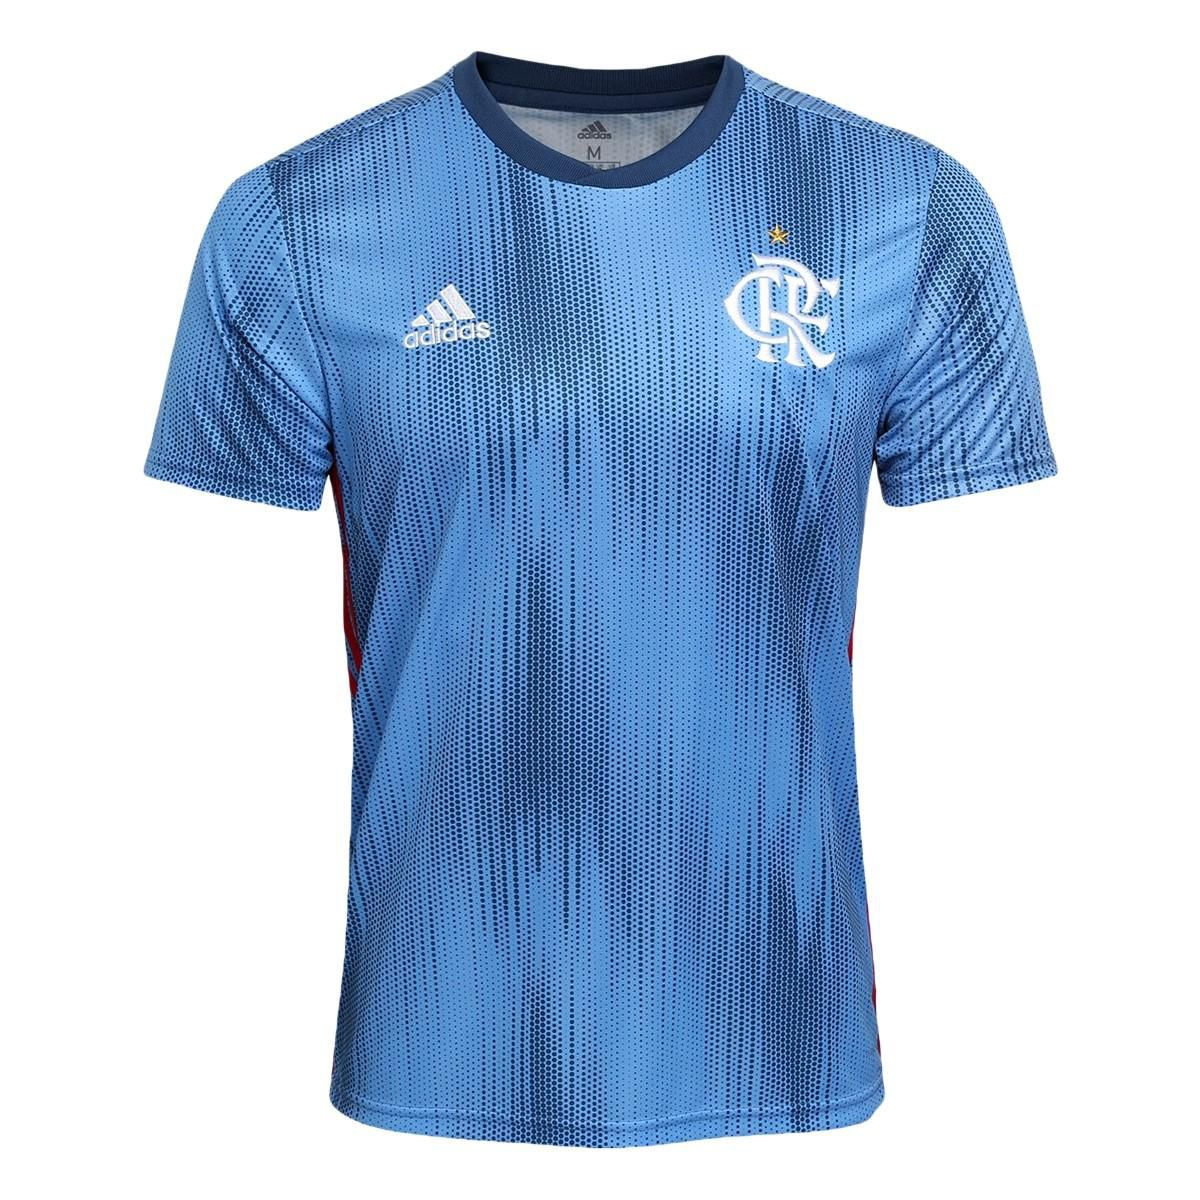 d821e27bbb2 Camisa Masculina Adidas Flamengo Crf 3 Jsy - BRACIA SHOP  Loja de ...